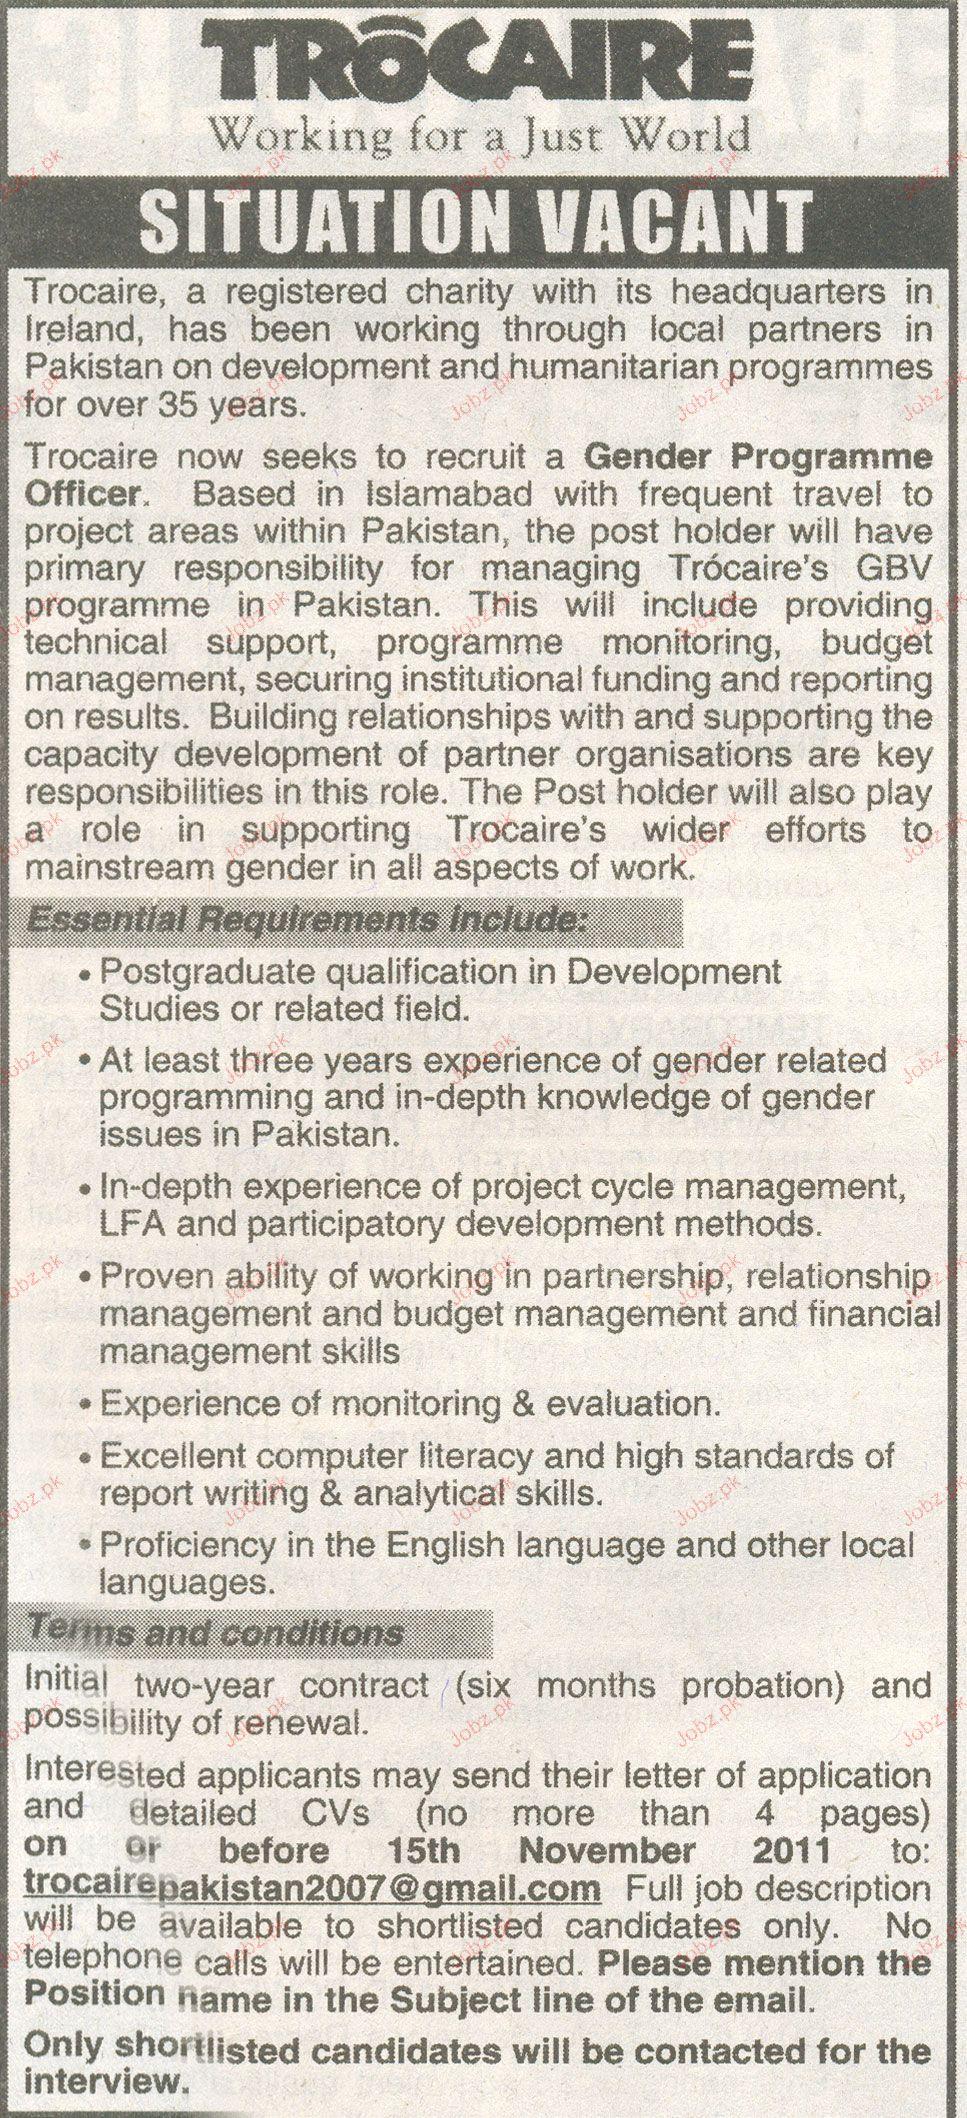 Gender Programme Officer Job Opportunity